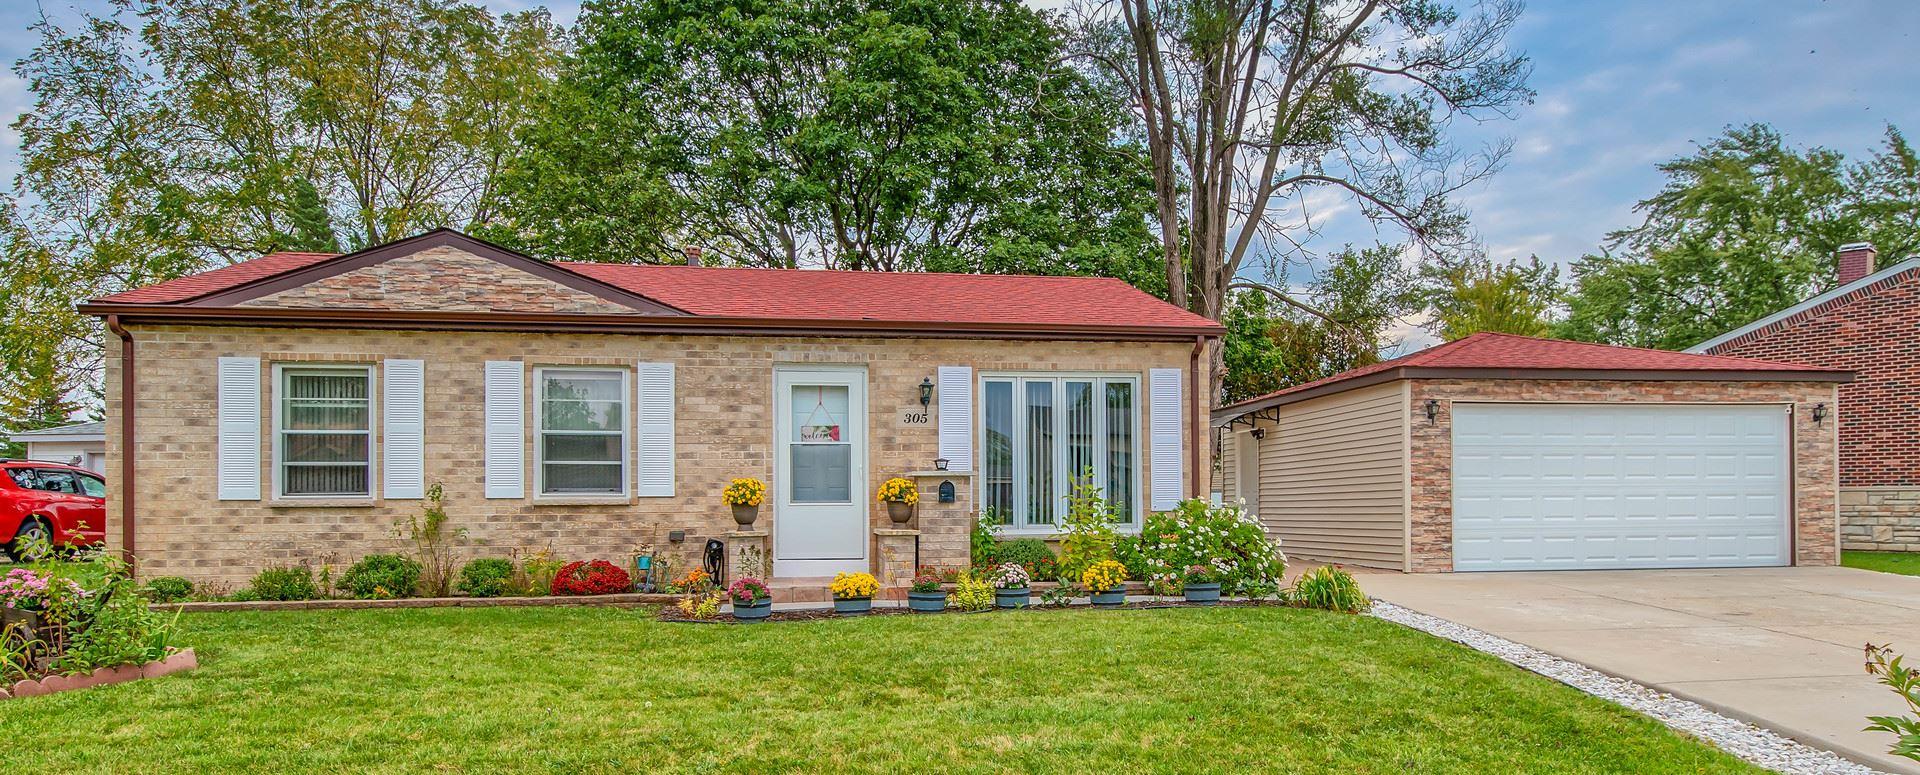 305 Ridge Circle, Streamwood, IL 60107 - #: 11244586